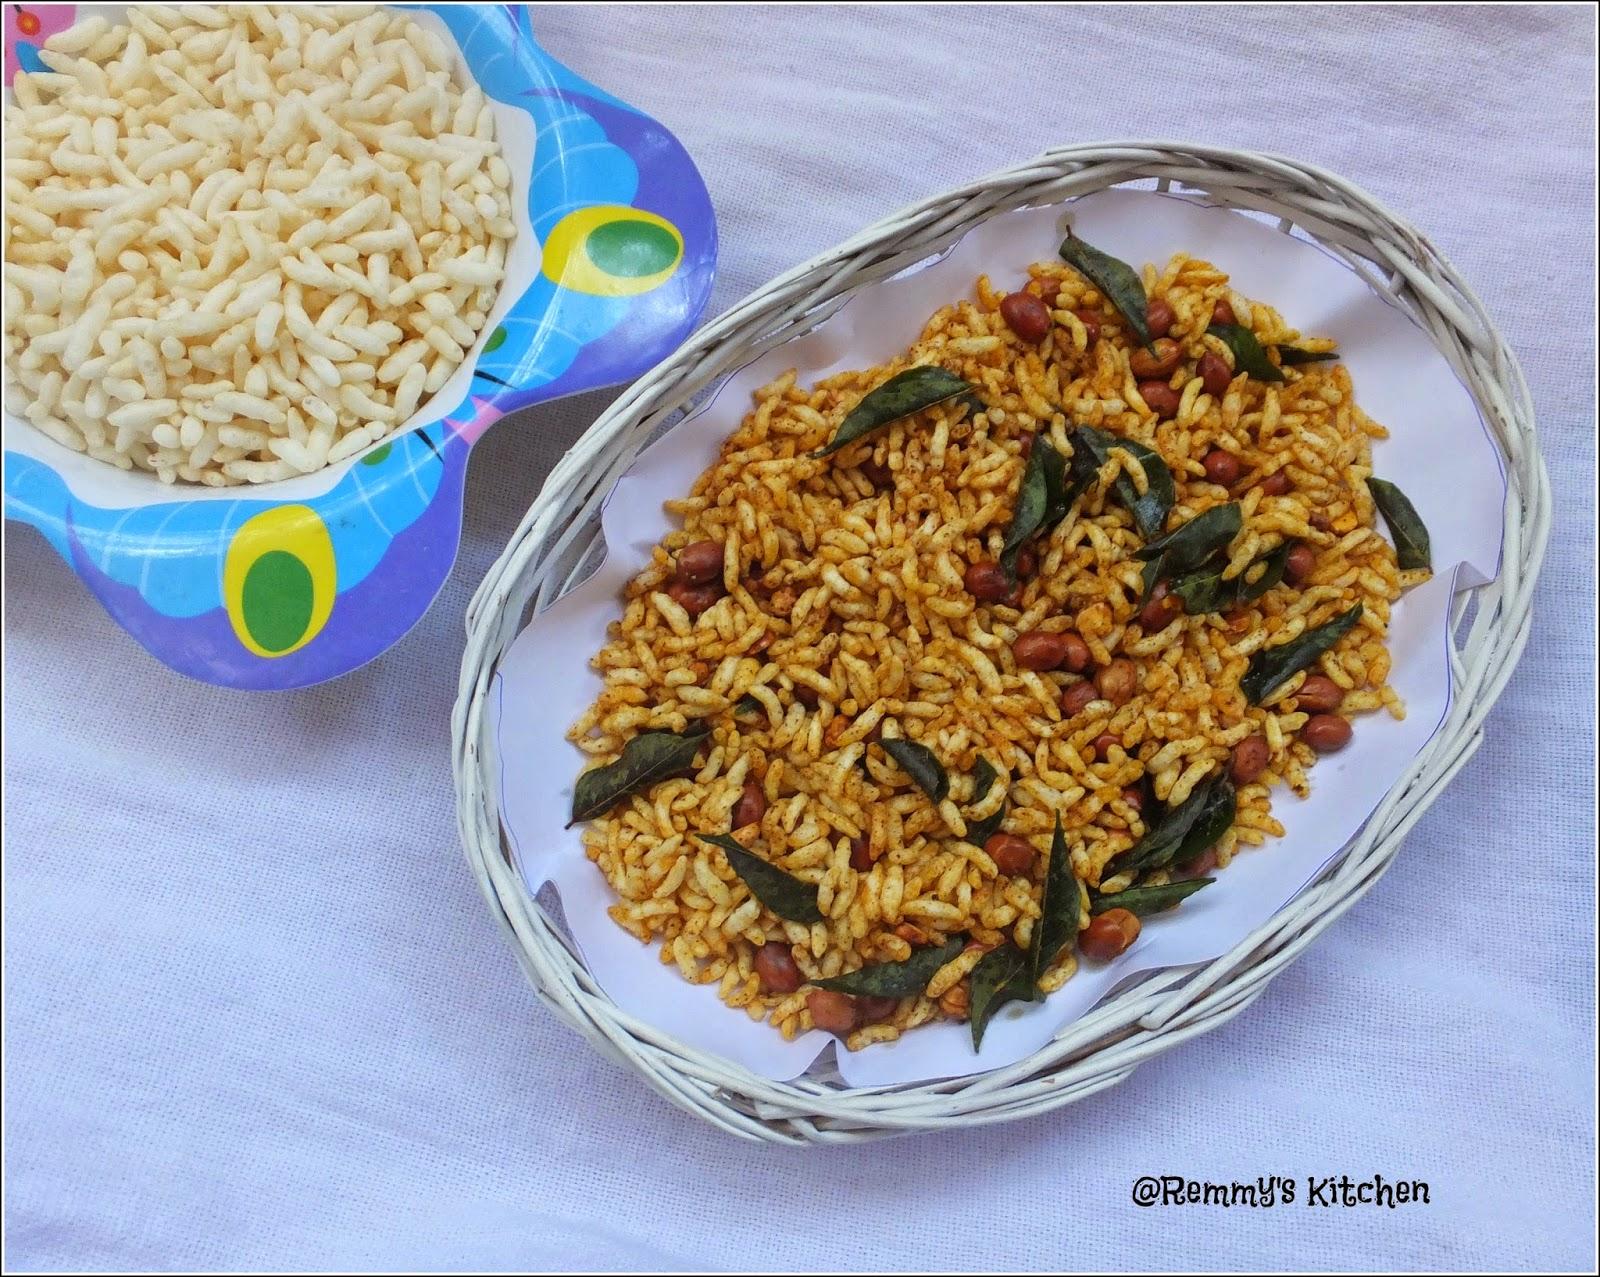 Kara pri / Spicy puffed rice / Spicy murmura